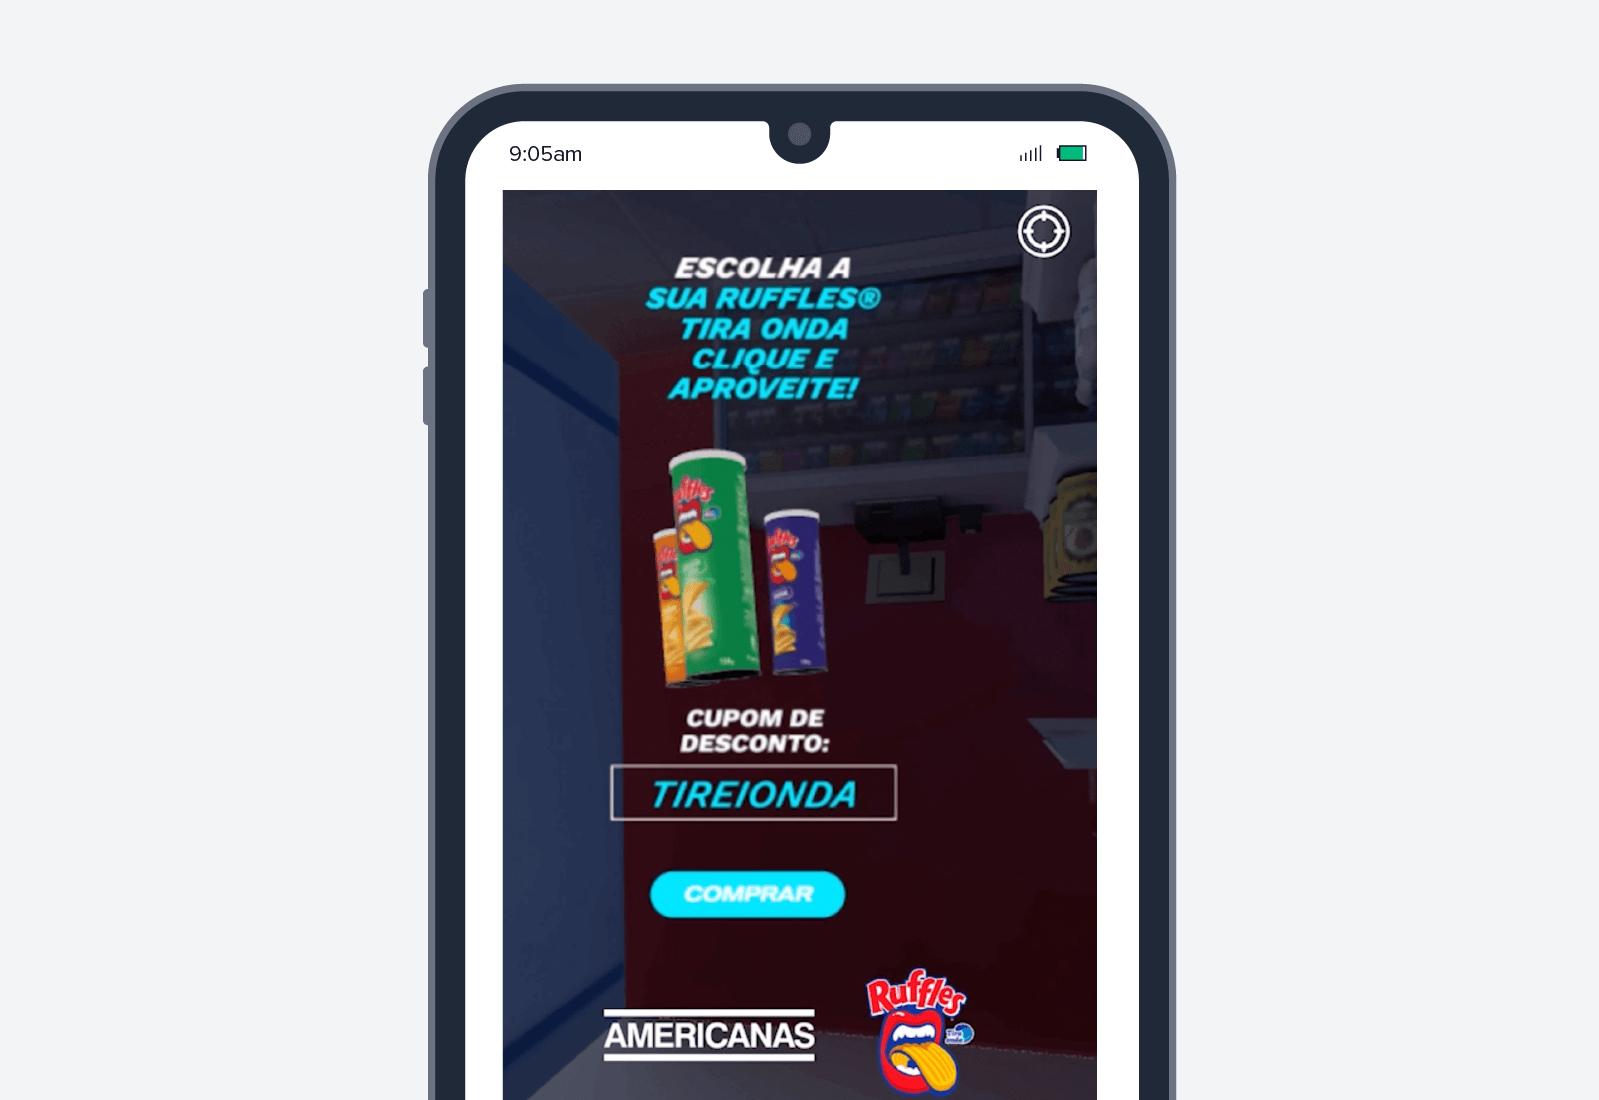 ruffles mobile advertisement